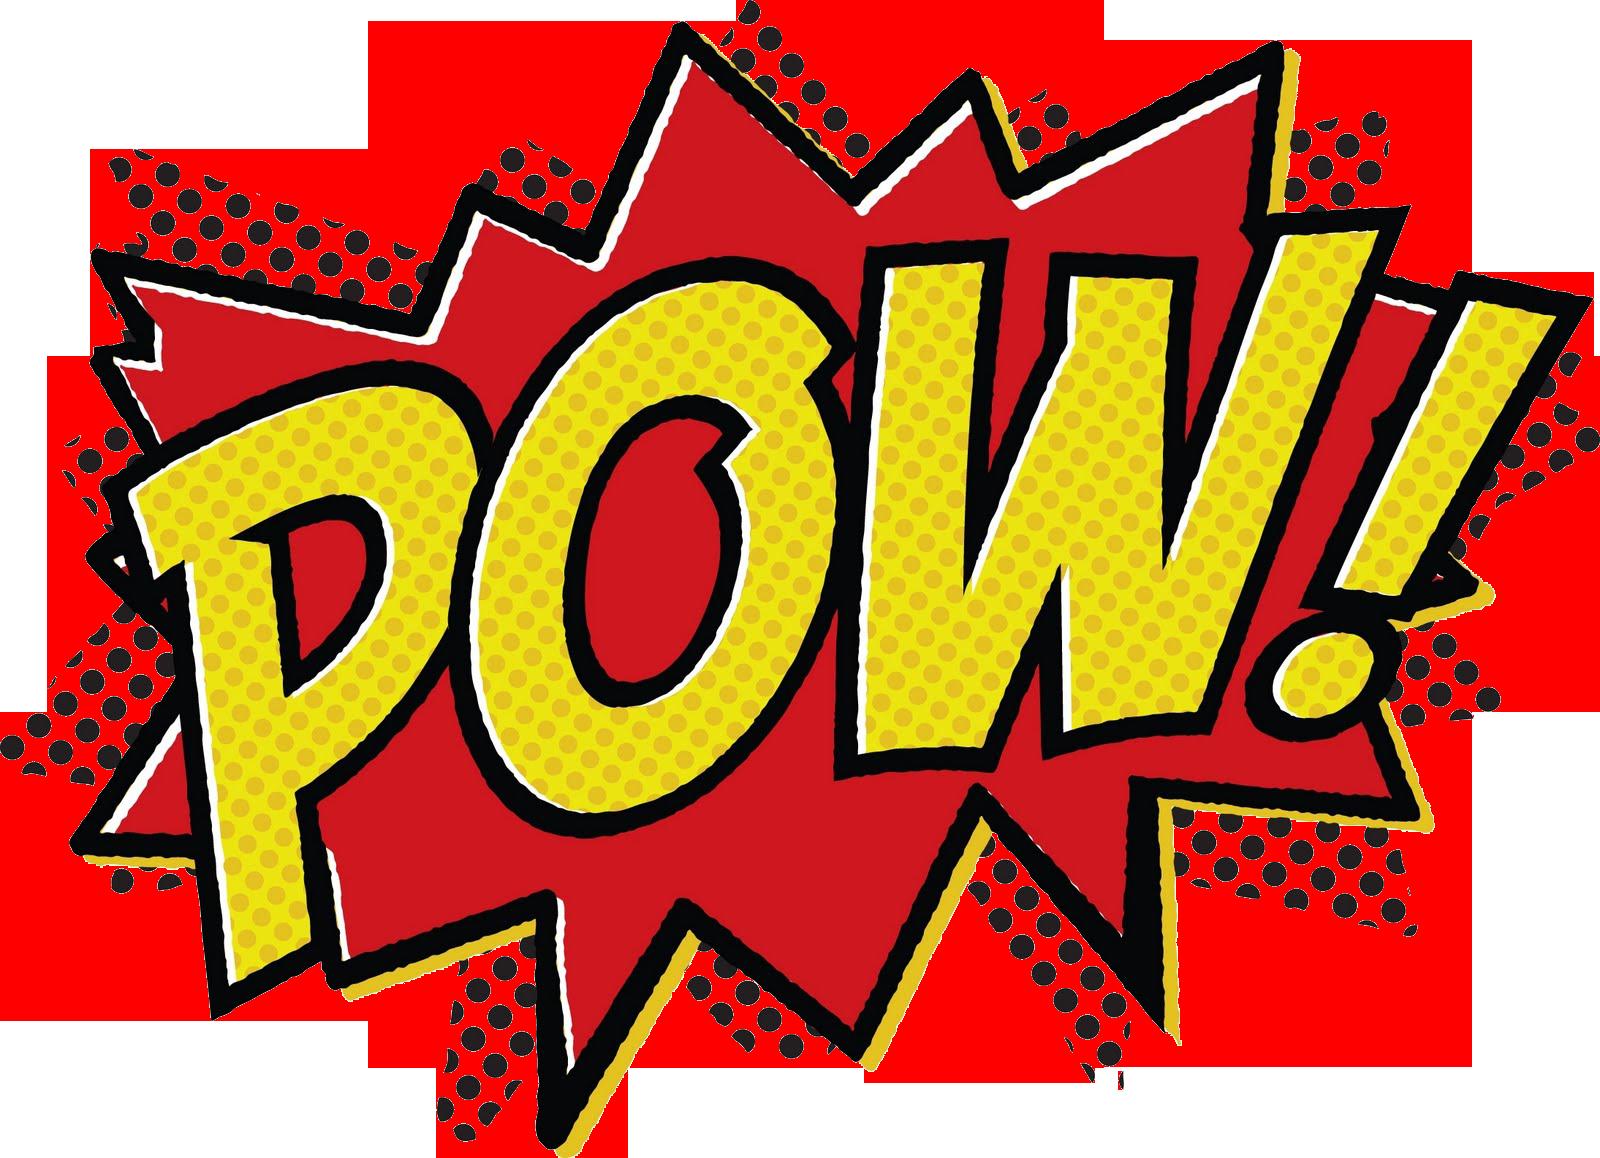 Super Hero Words Clip Art C1f0fc9eadbeb2cf6e5jpg - Superhero PNG